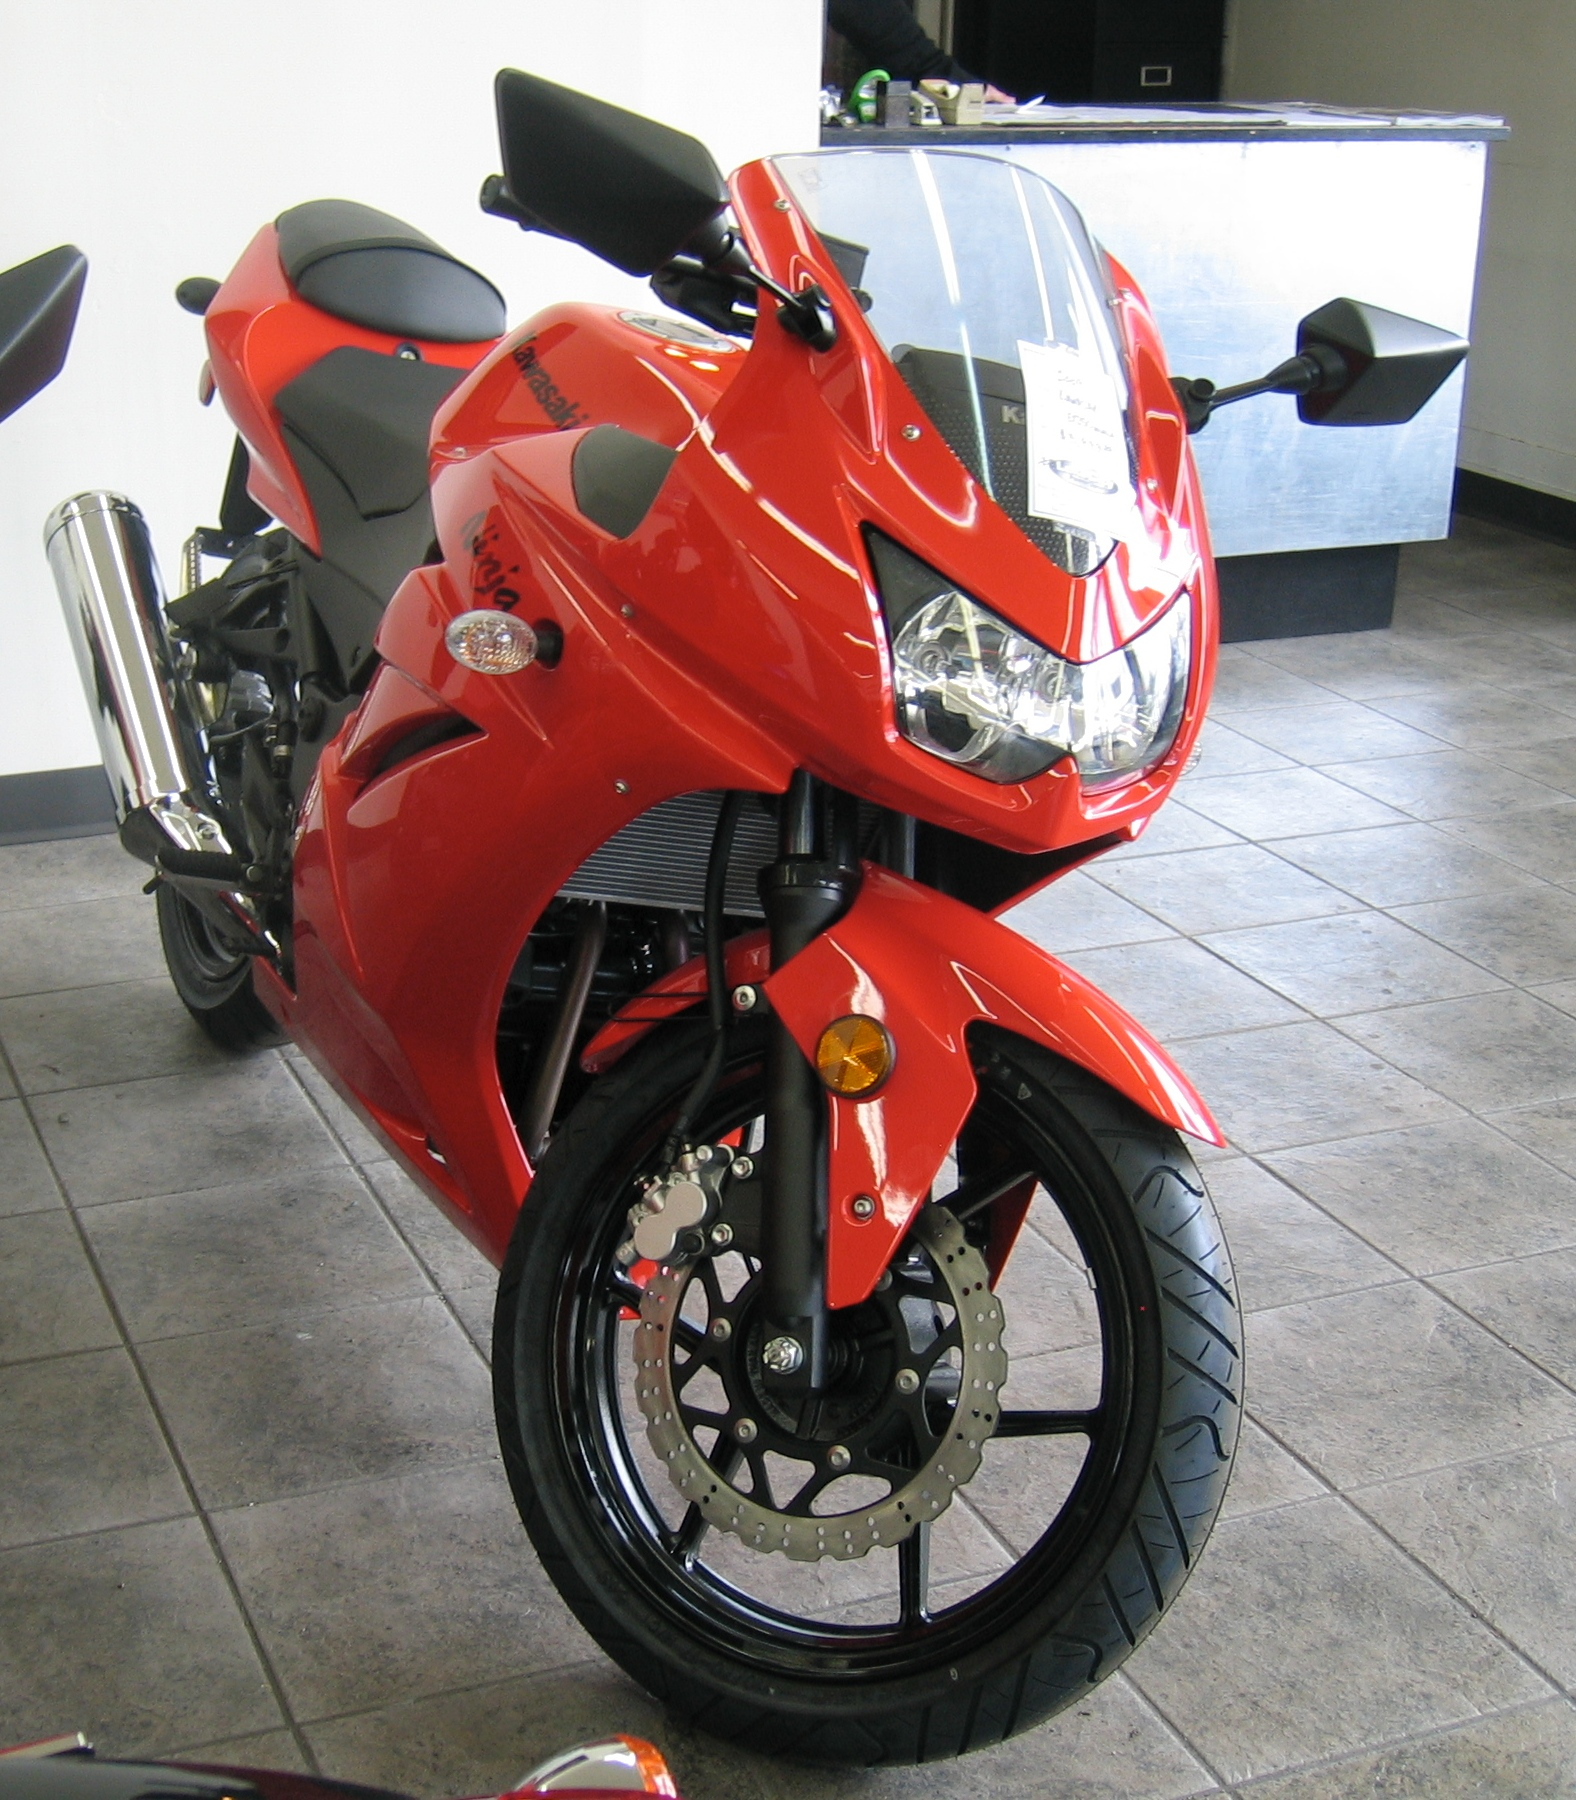 2009 Kawasaki Ninja 250R Picture